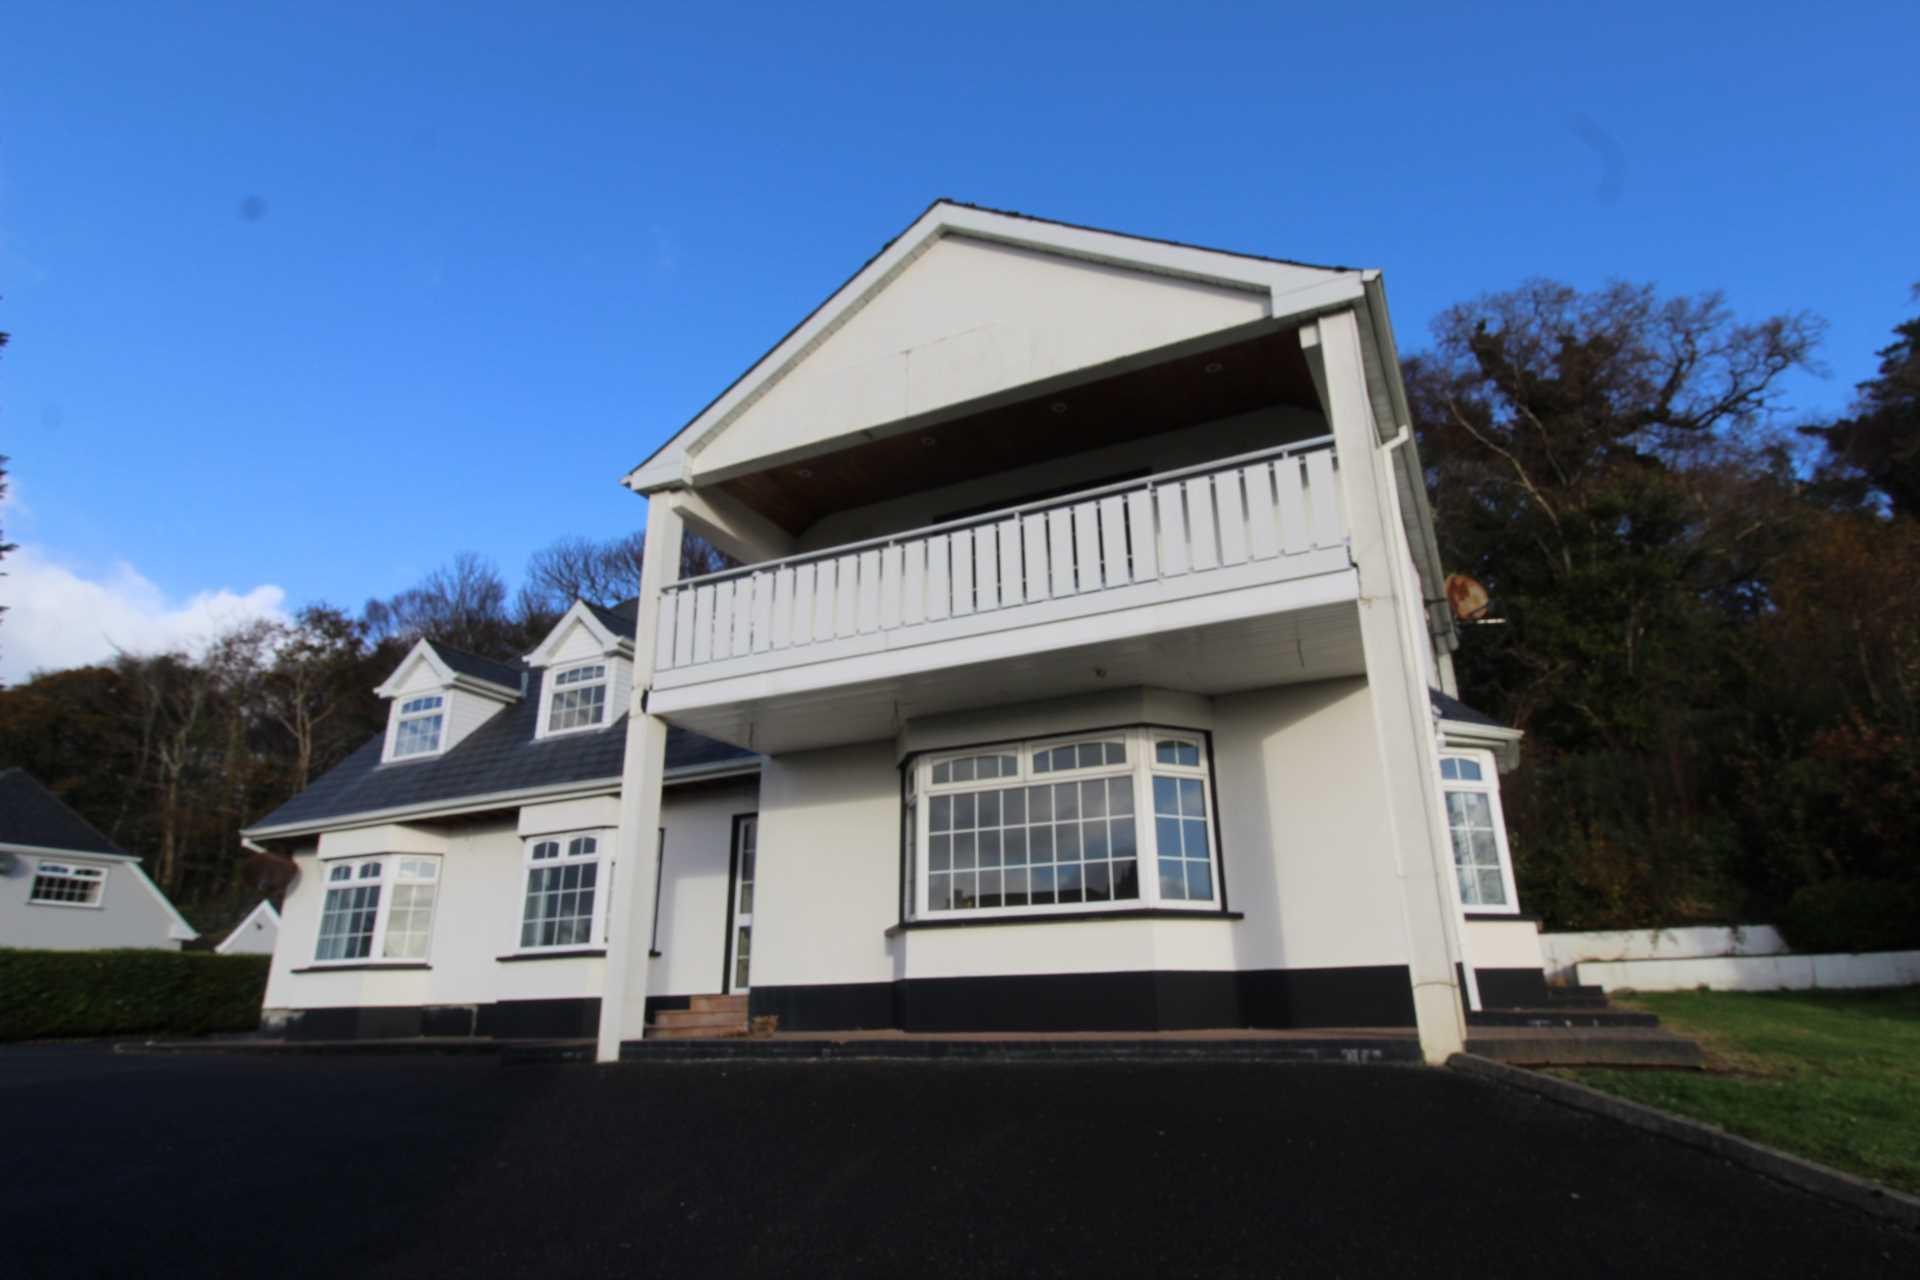 Apartment 1, Eccles House, Killarney, Co. Kerry